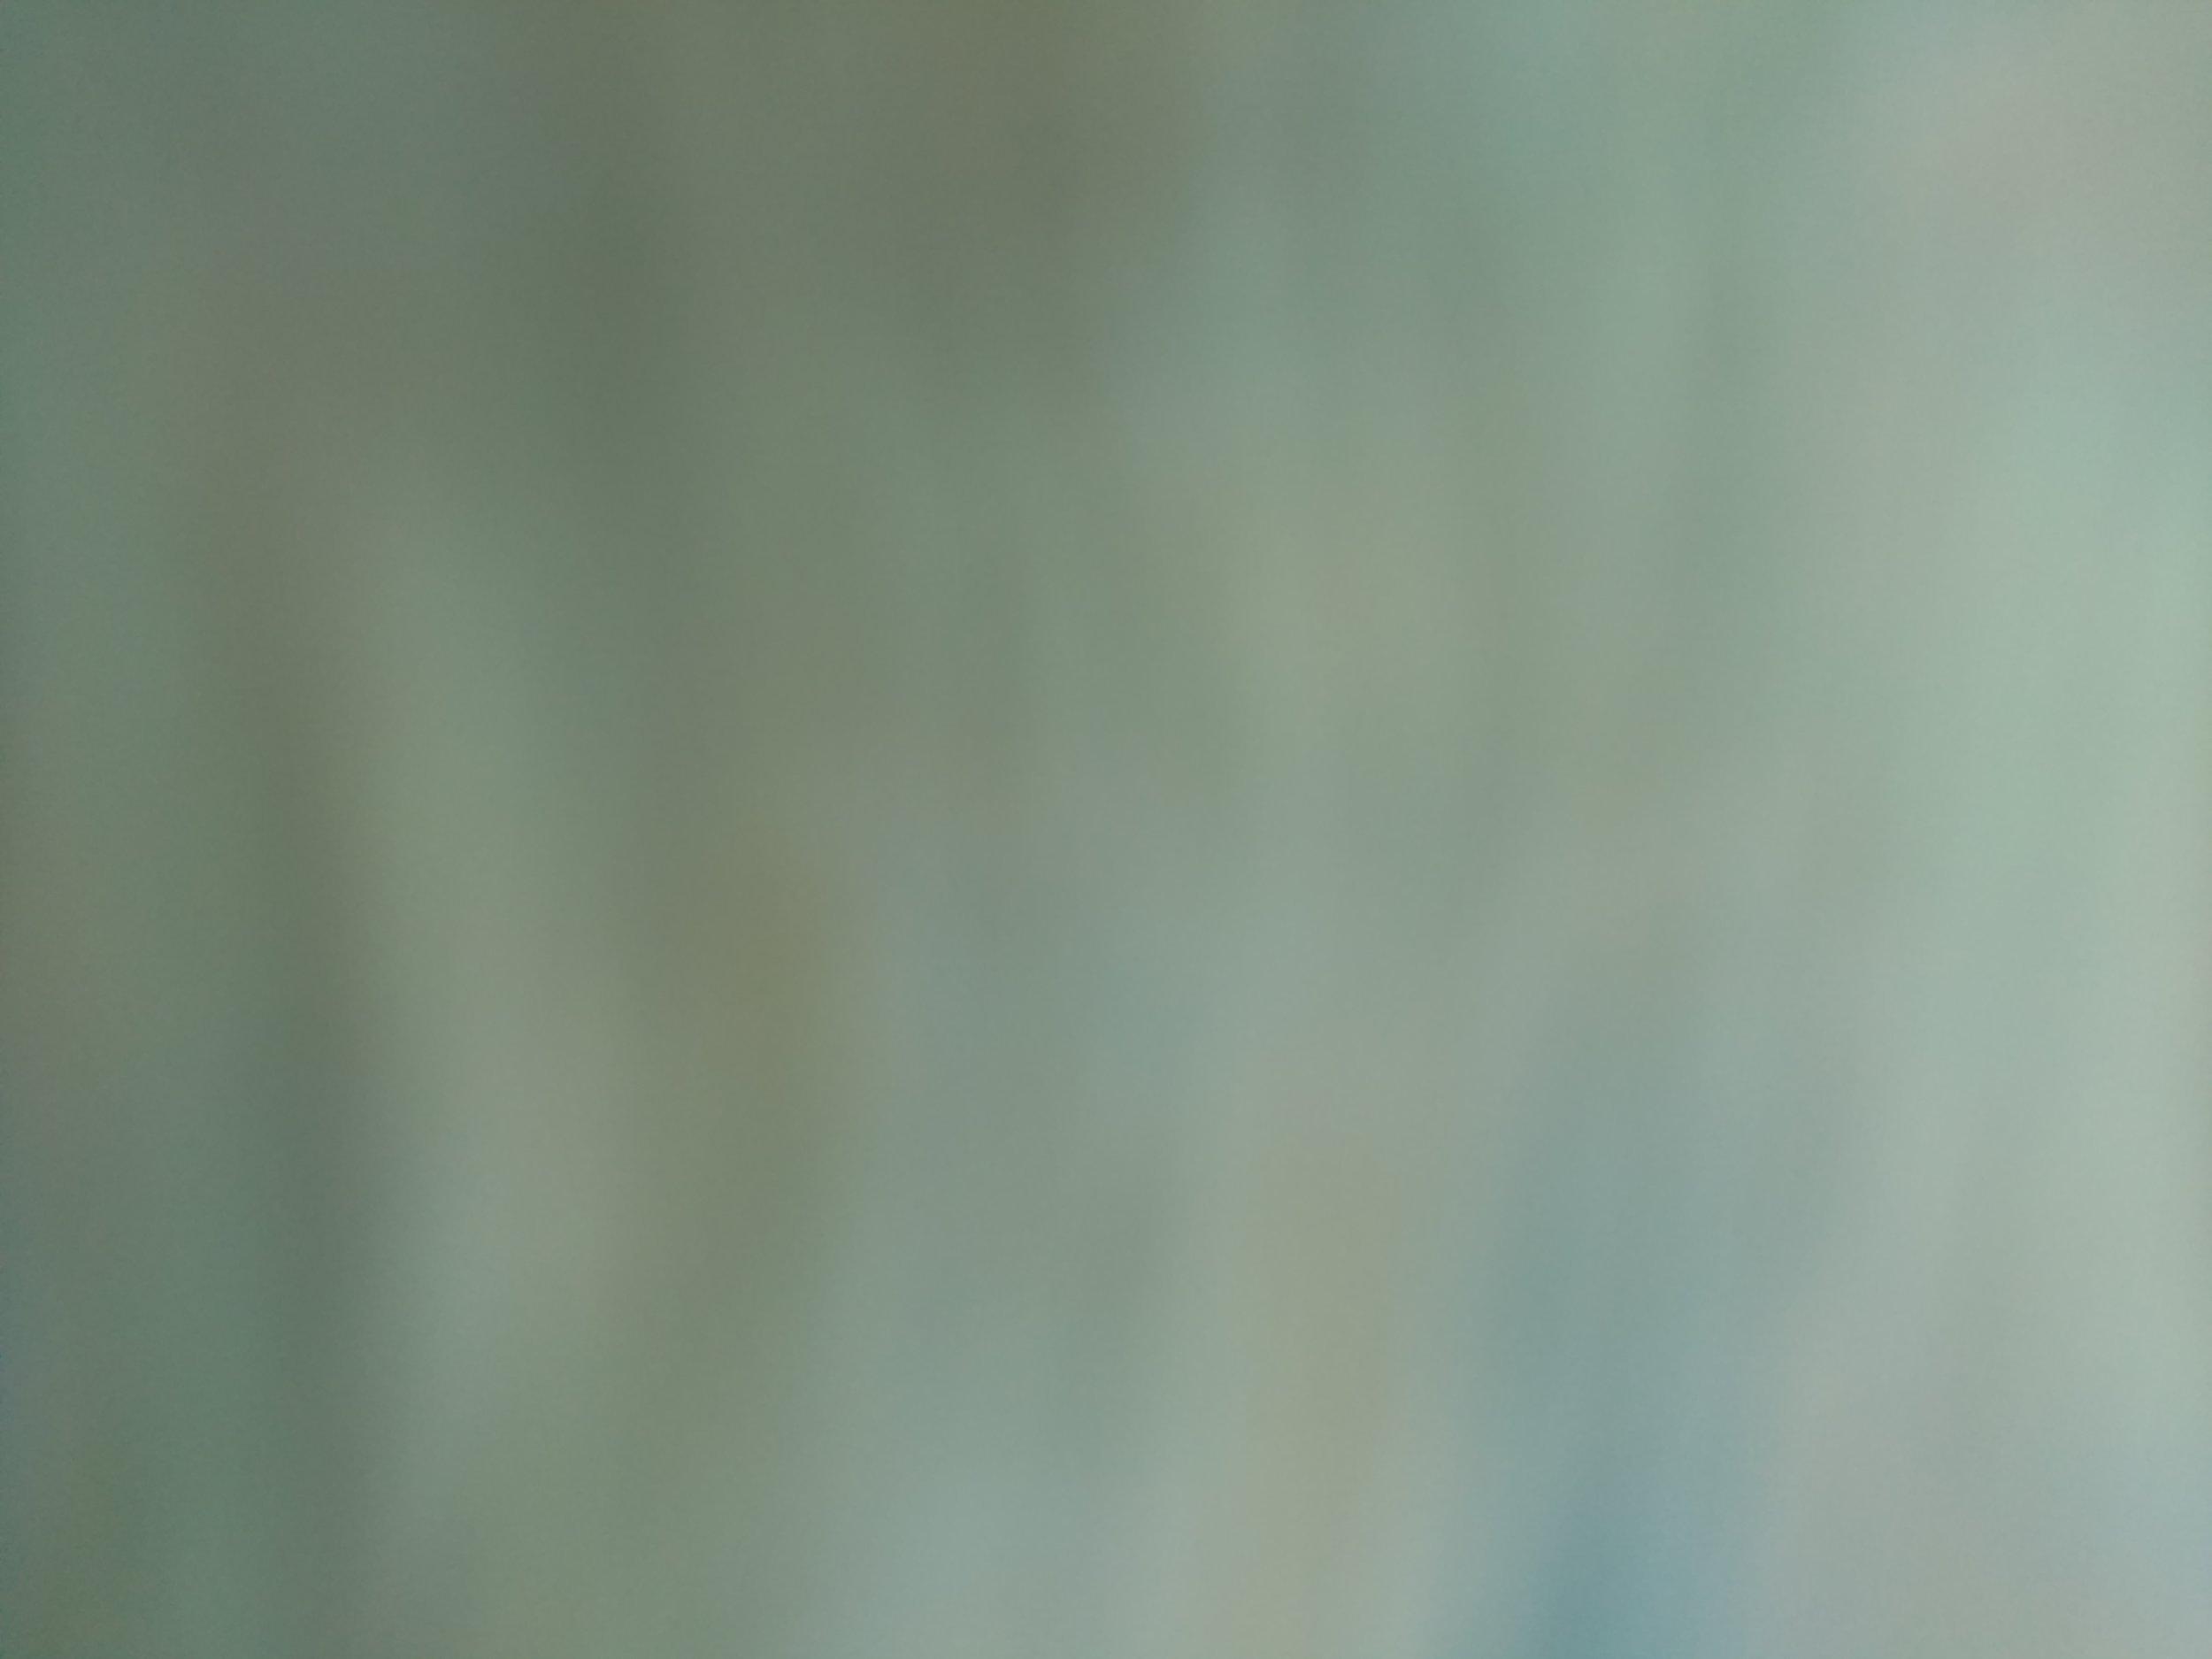 willroth-co-free-texture-gradient-046.jpg